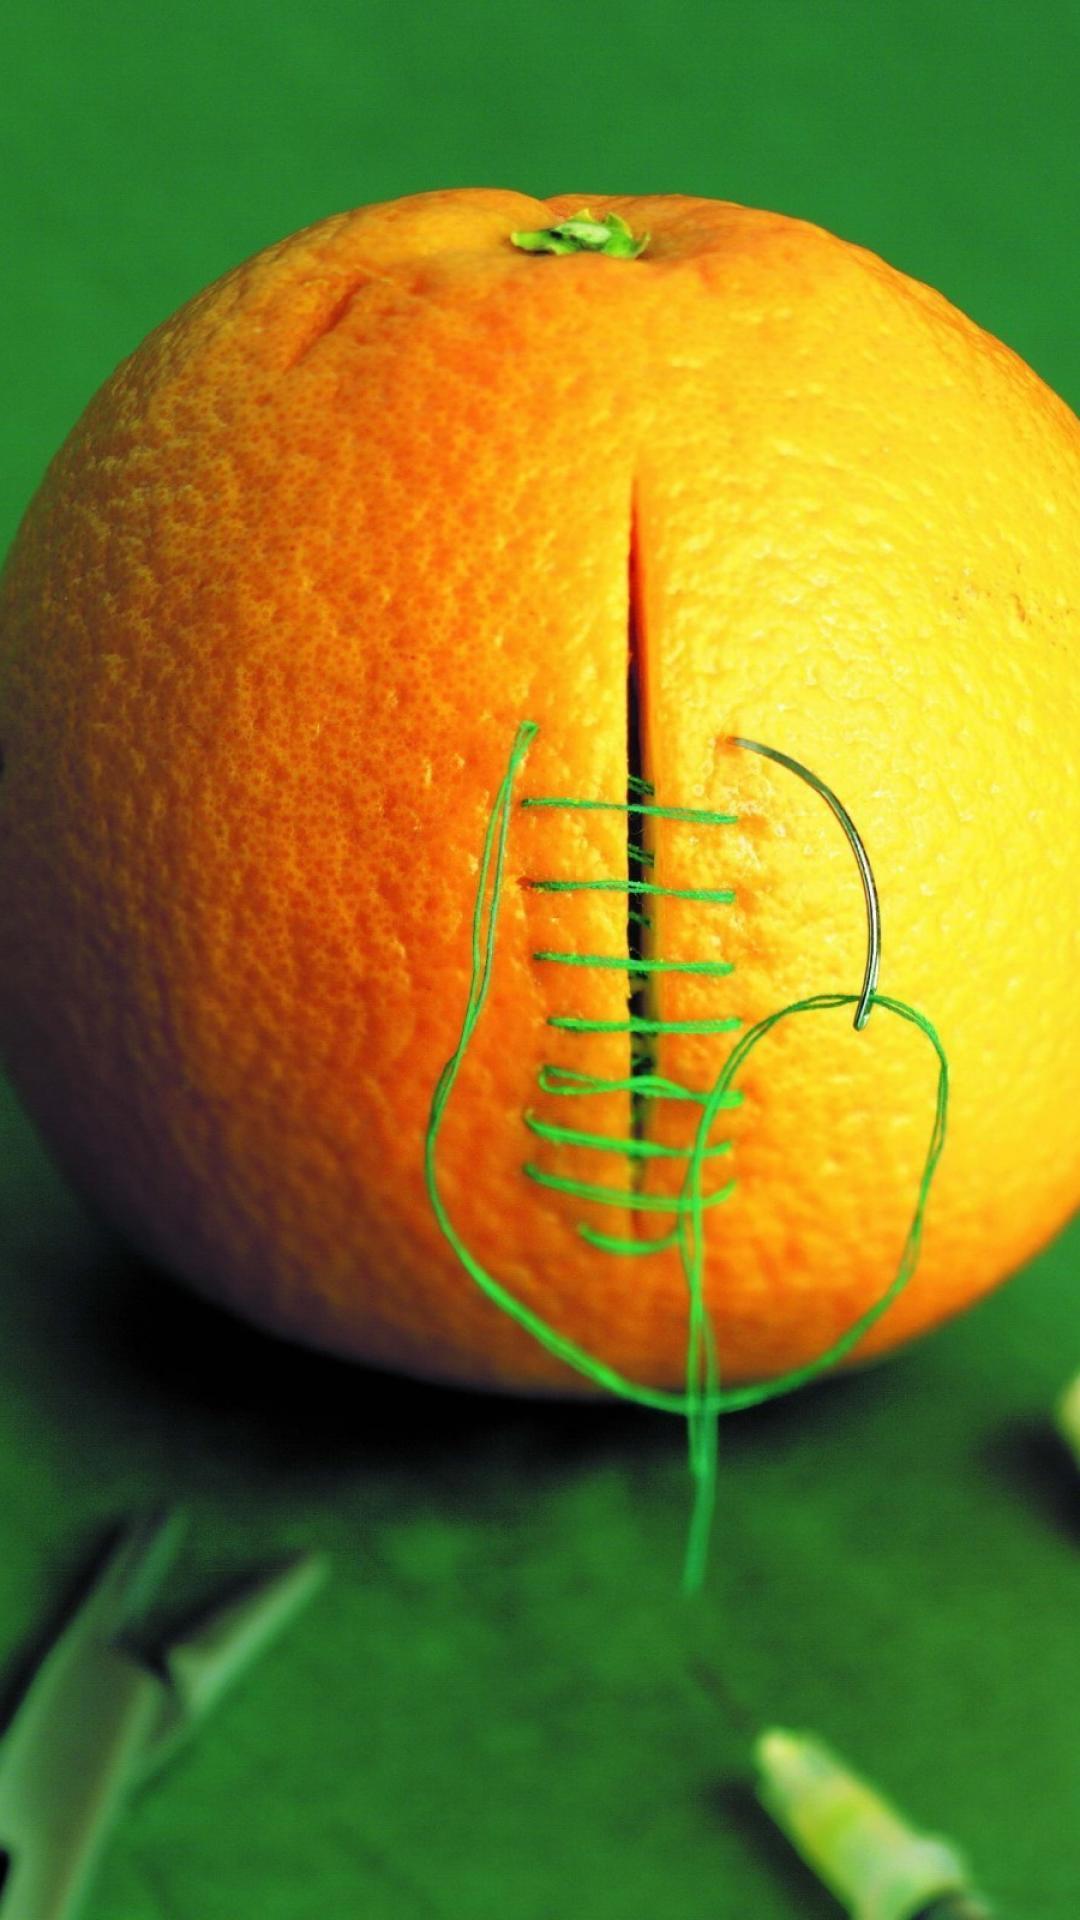 Orange funny medical stitch cutting green background wallpaper 1080x1920